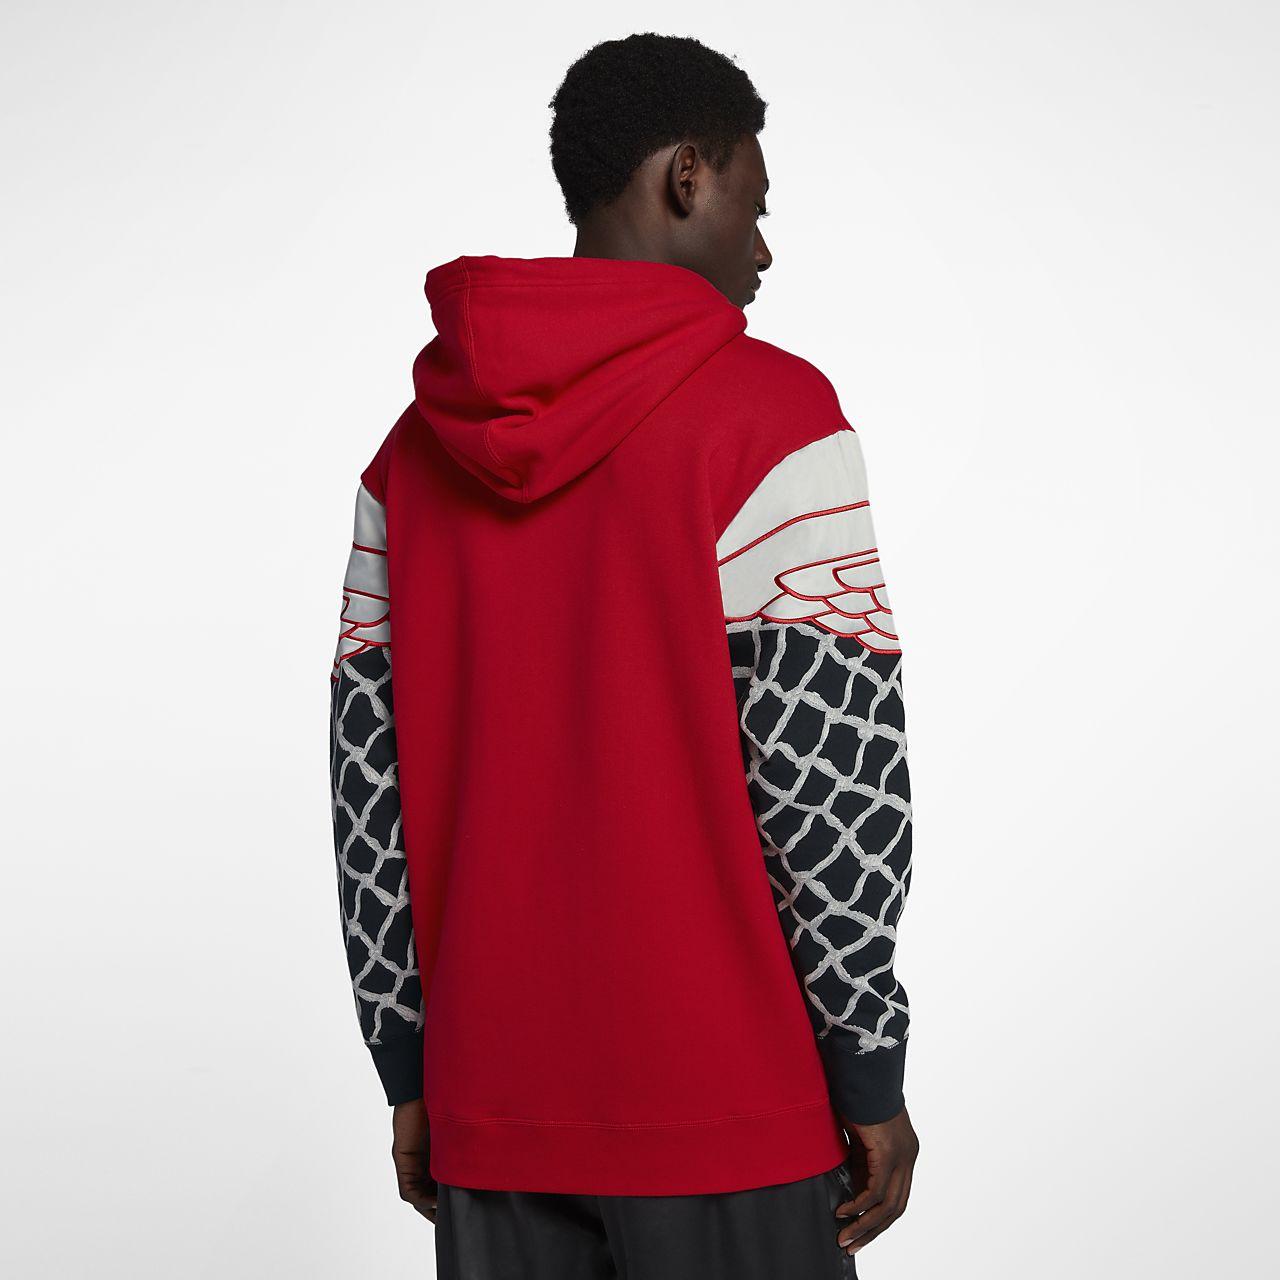 0adf41113e Jordan Sportswear Pinnacle Men's Pullover Hoodie. Nike.com NO